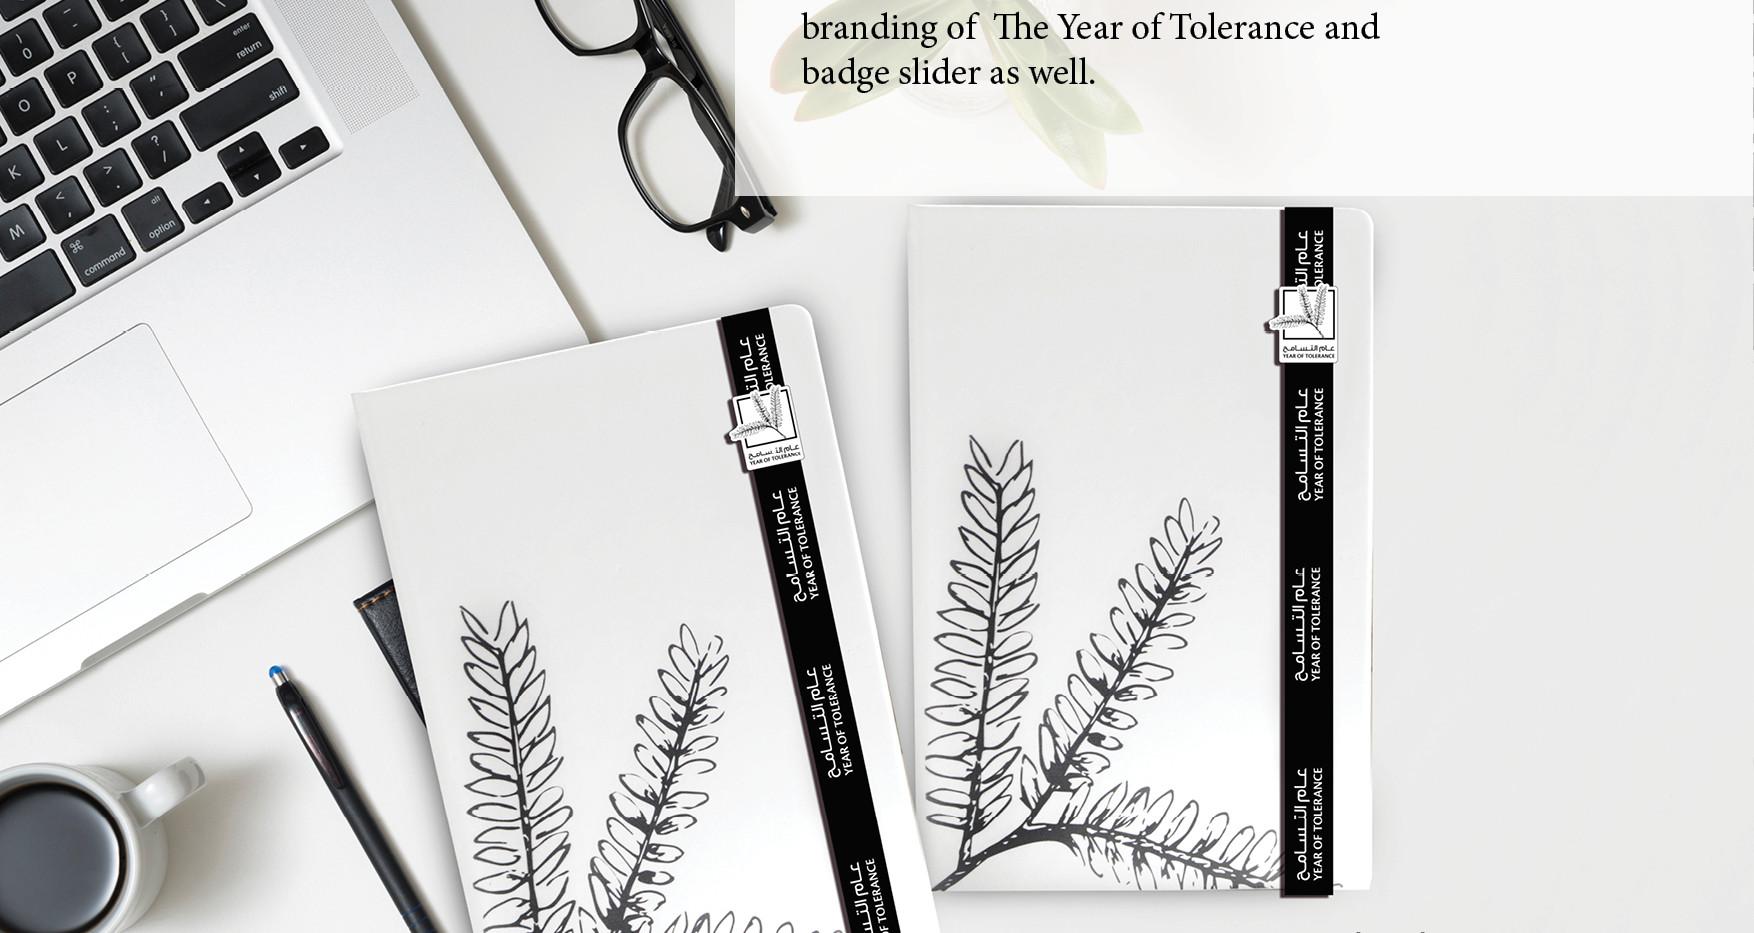 YEAR OF TOLERANCE_ALPHAART4.jpg